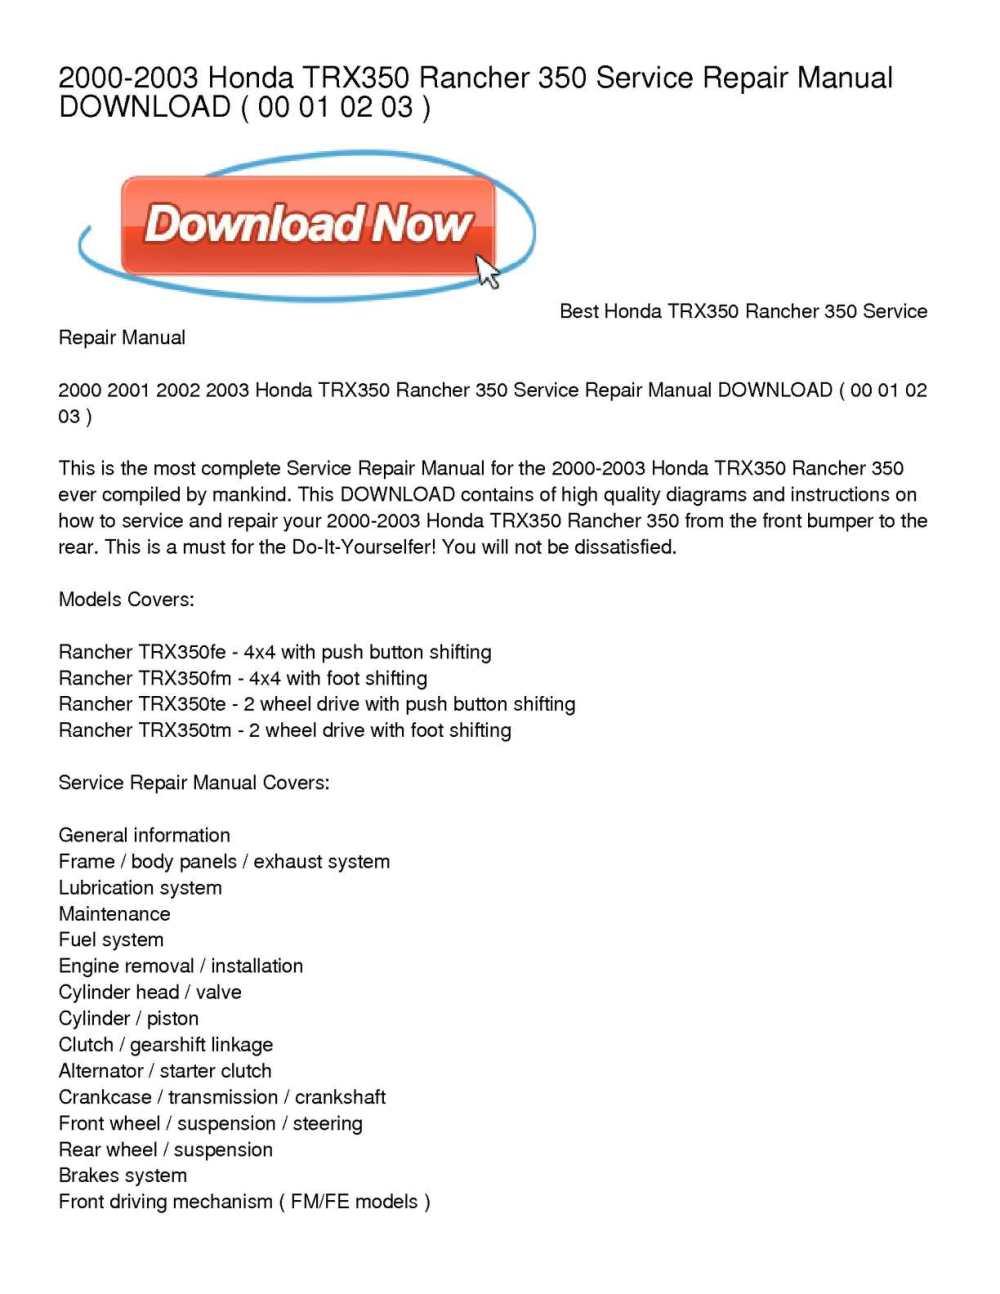 medium resolution of 2000 2003 honda trx350 rancher 350 service repair manual download